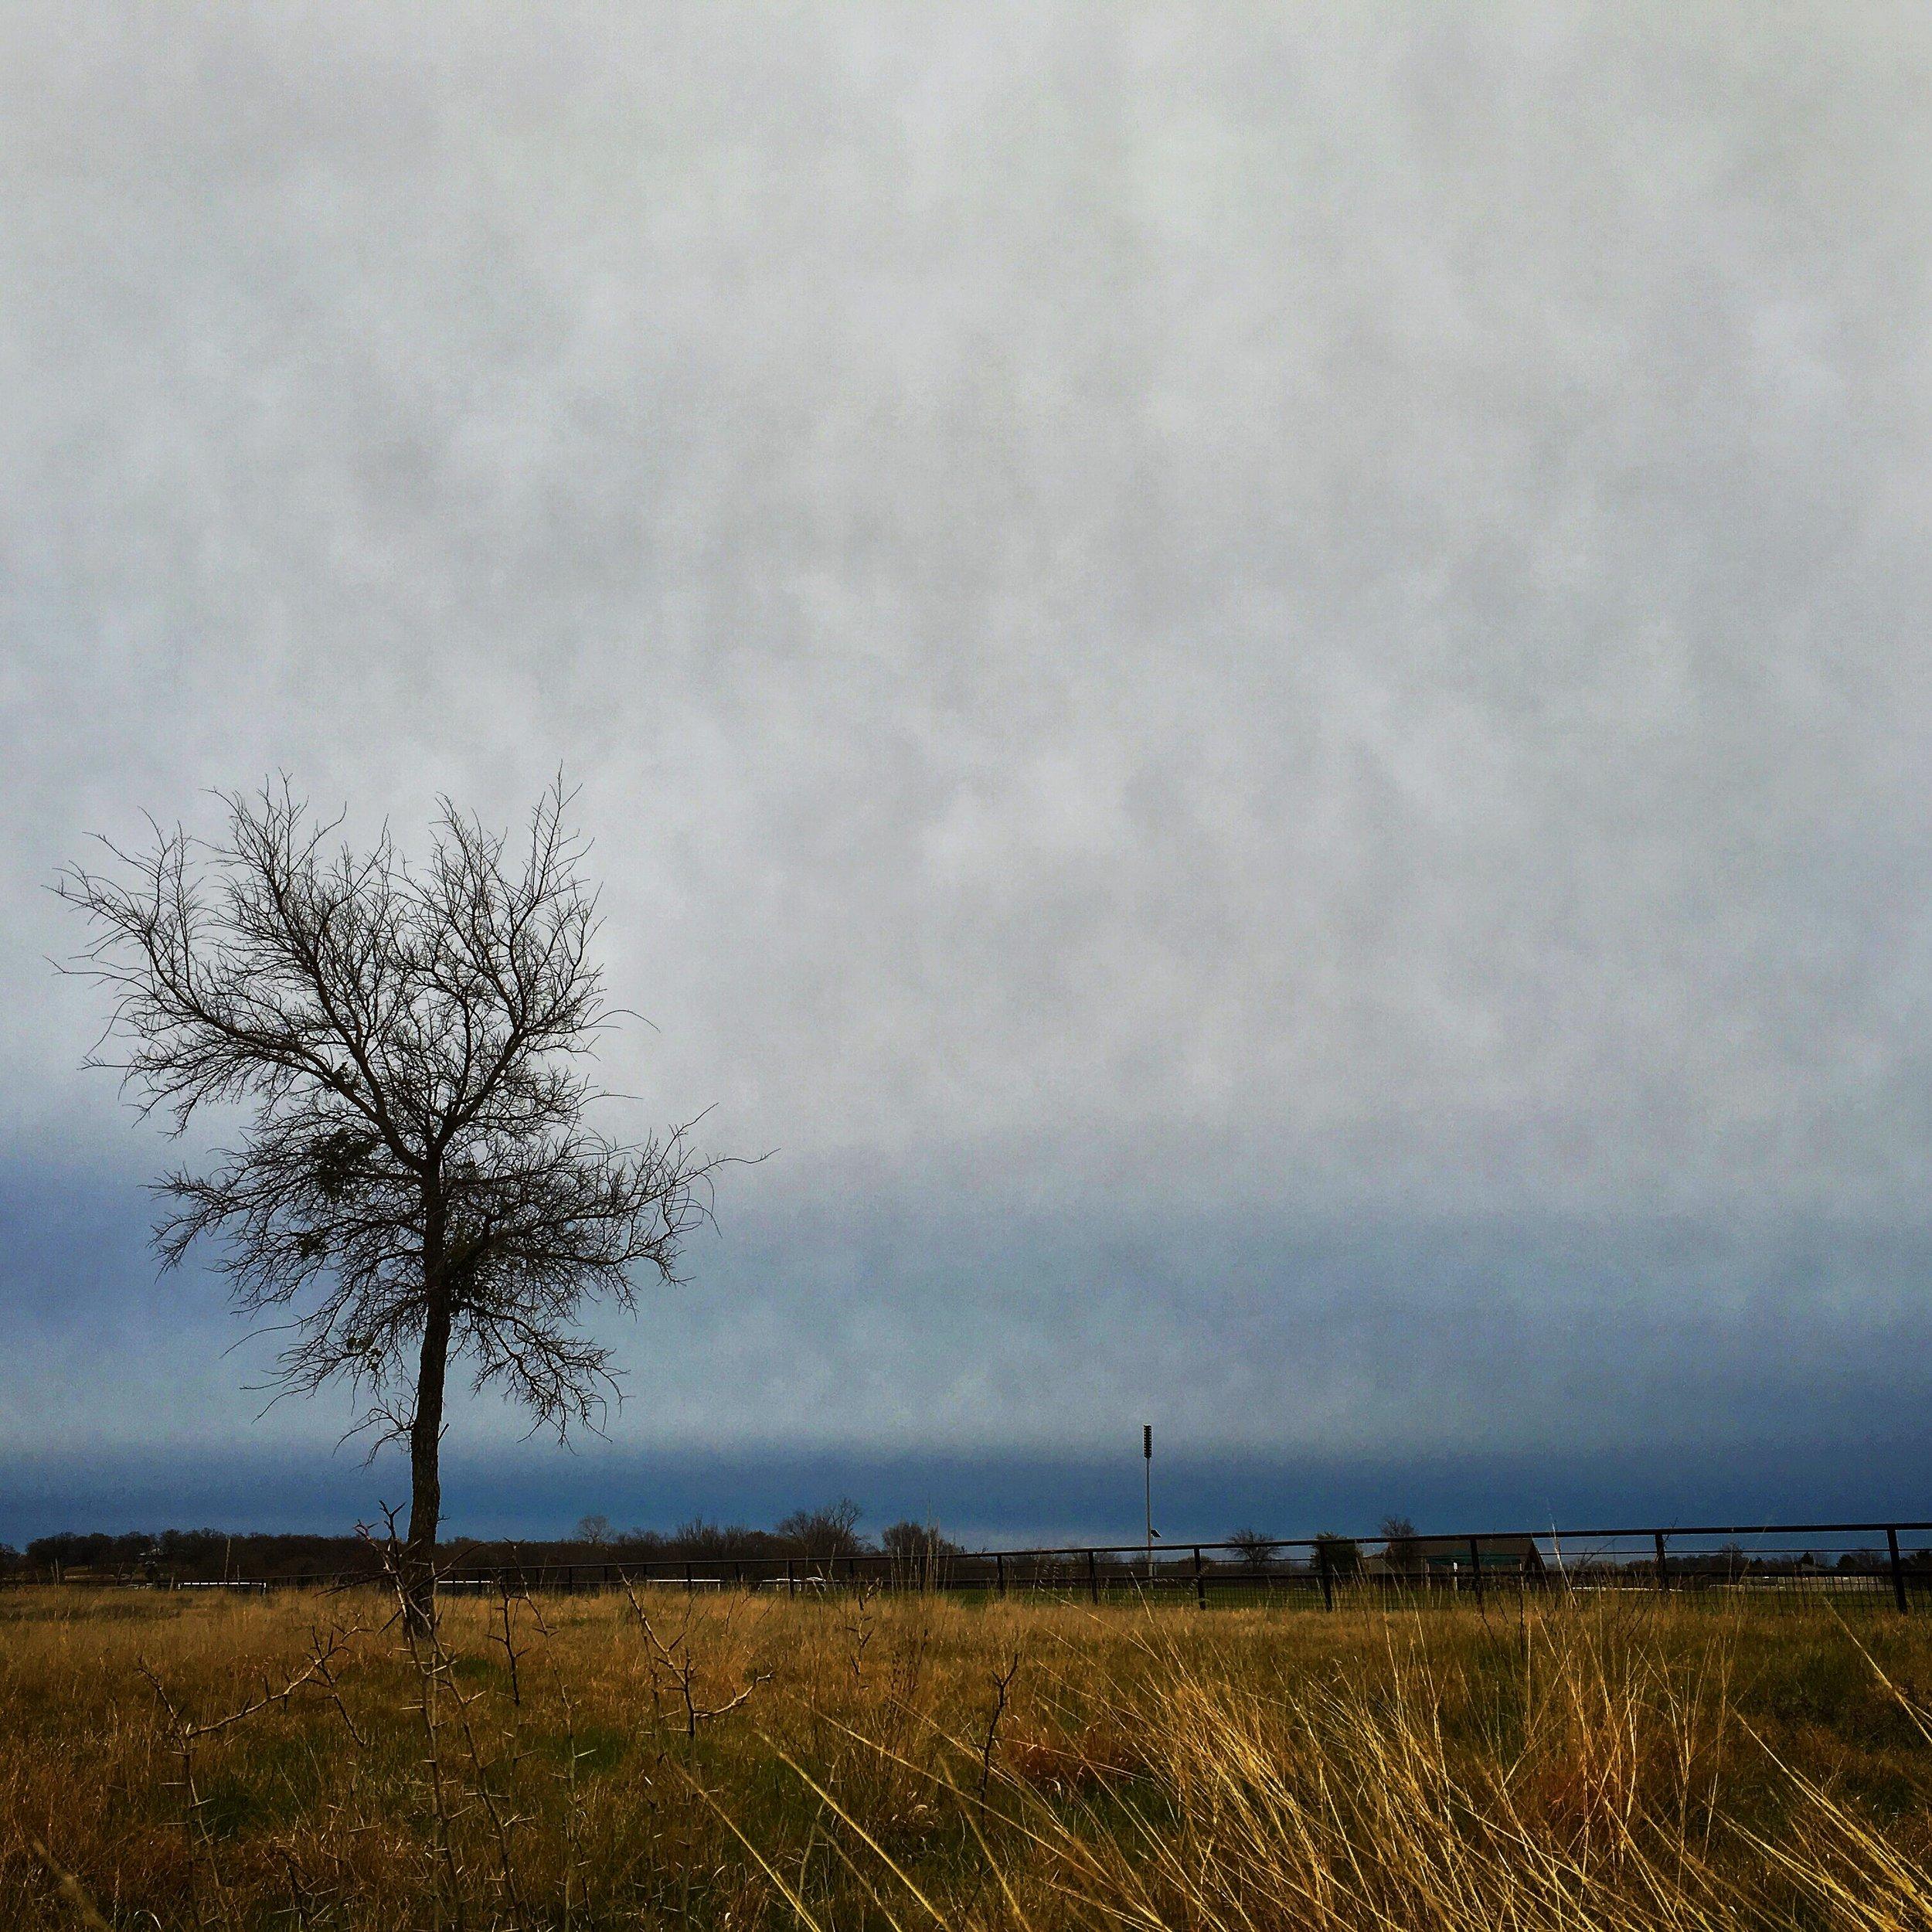 tree in winter, bob jones park, southlake, texas  ©Beatriz Terrazas, 2016